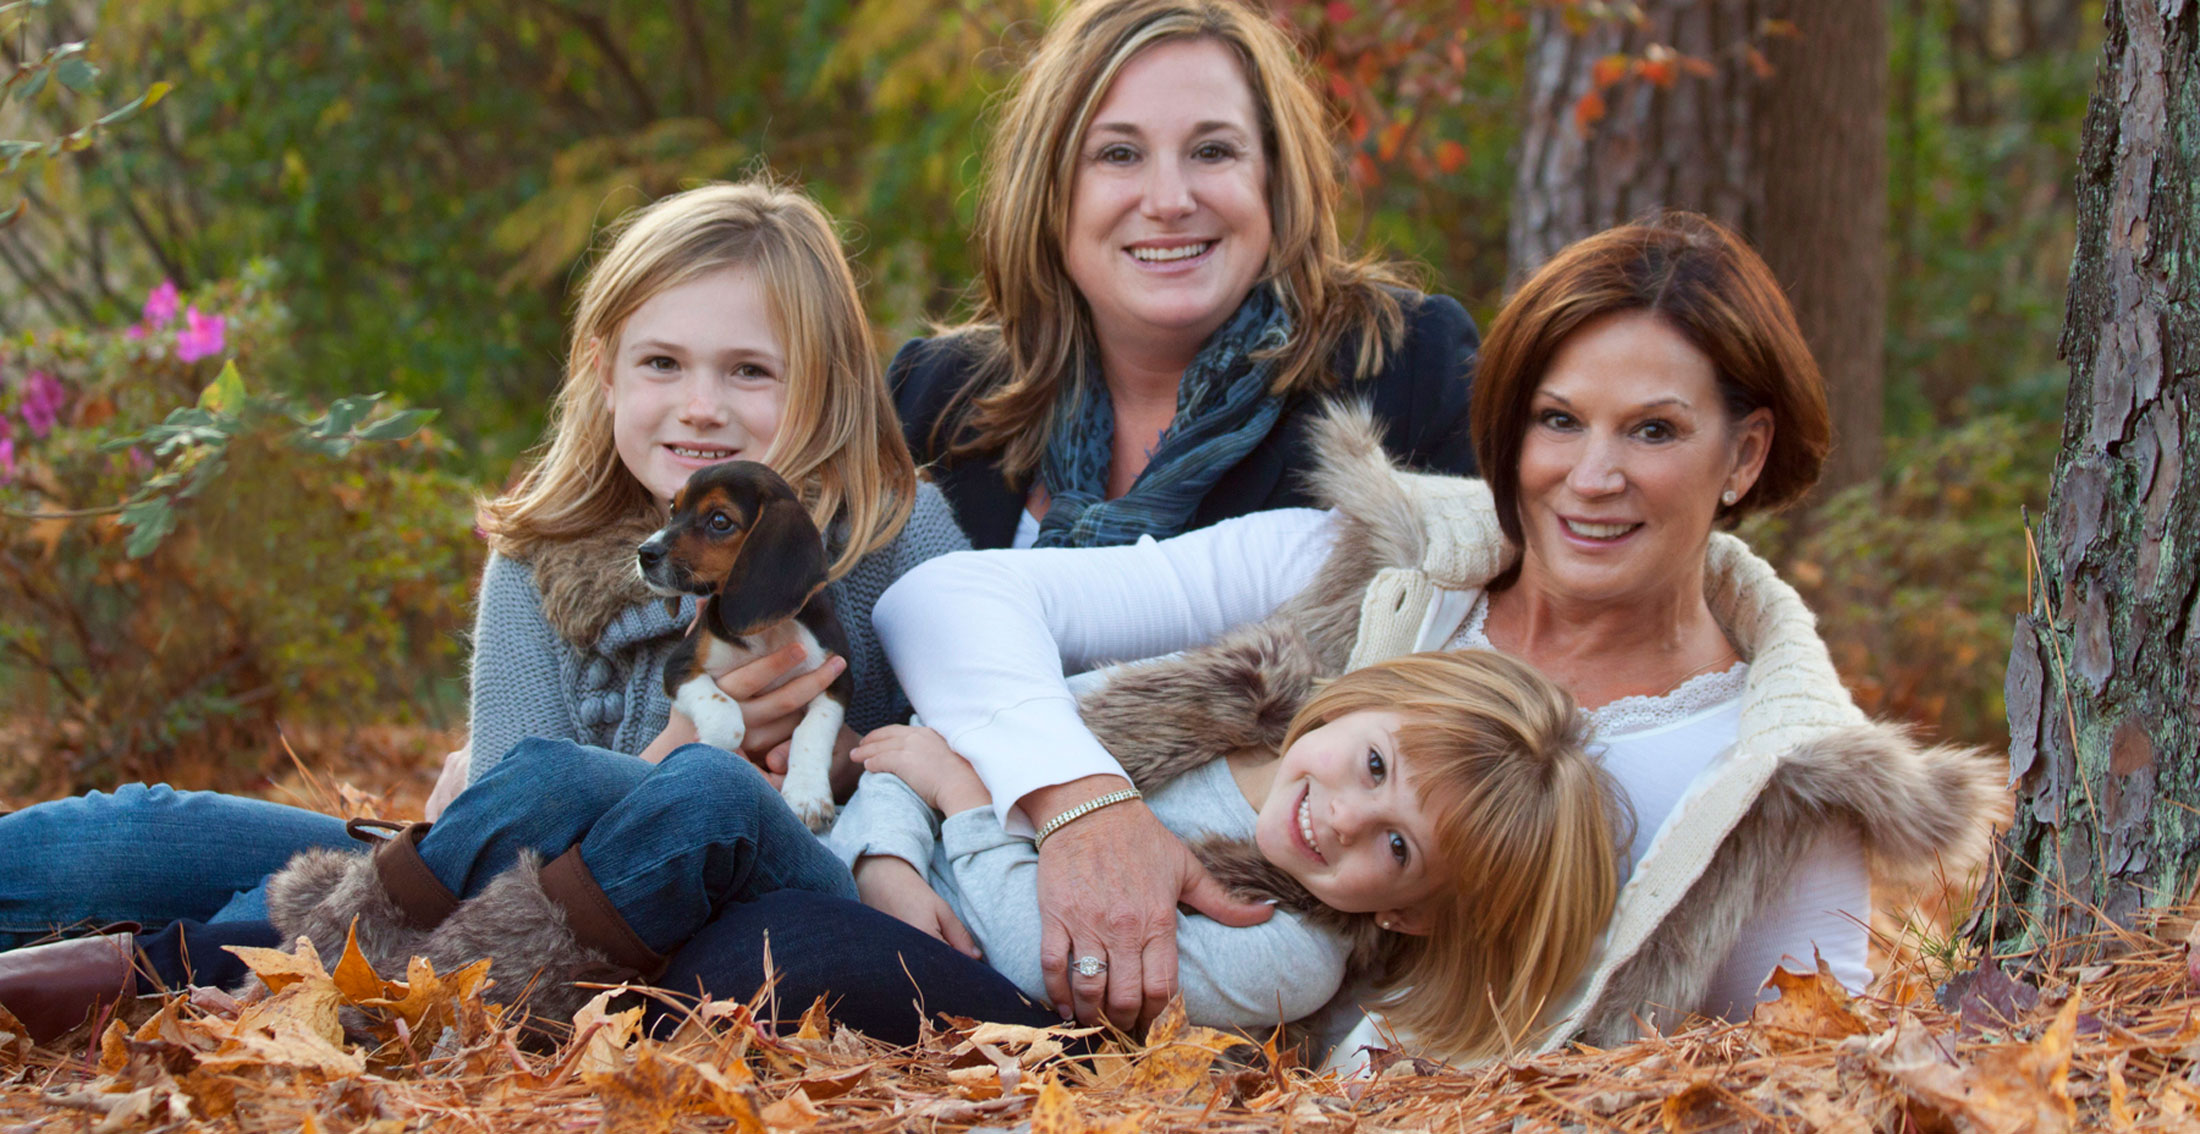 Deborah Young photo - family posing in woods, leaves